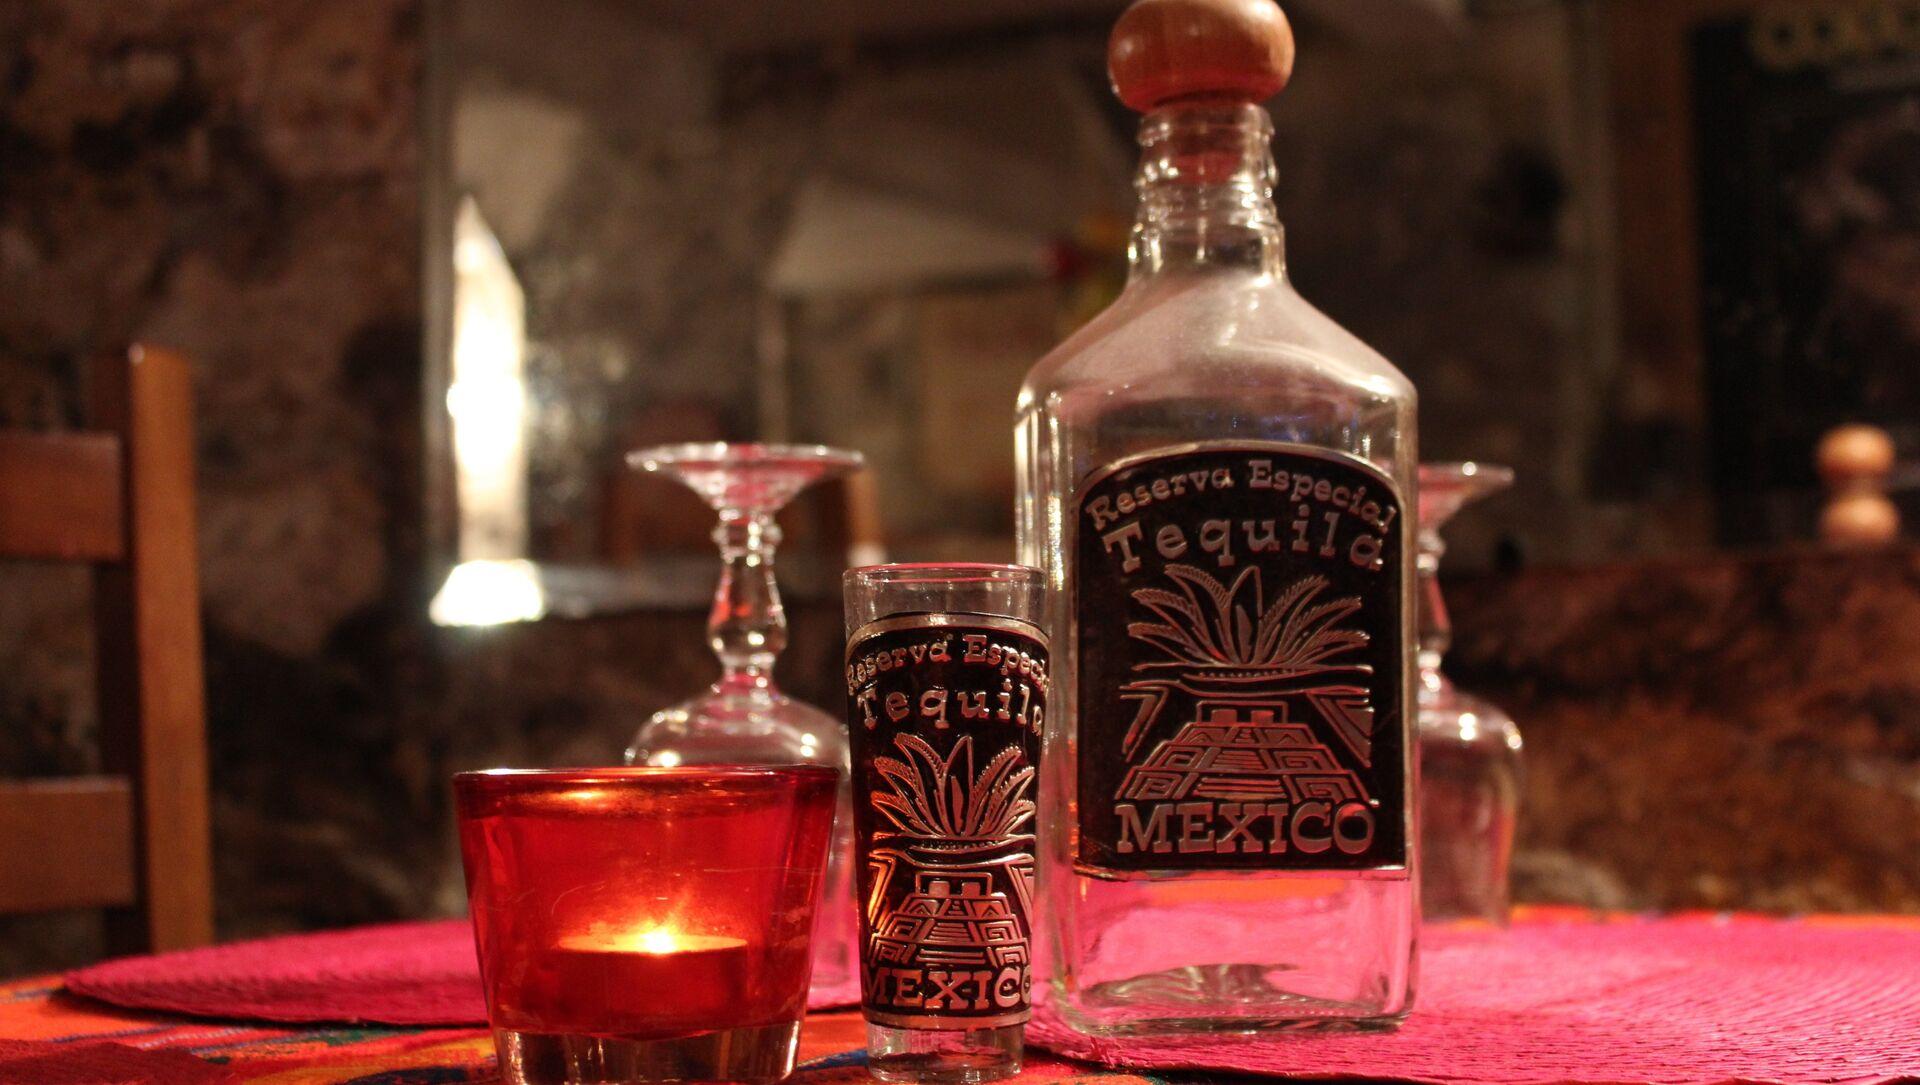 El tequila - Sputnik Mundo, 1920, 05.12.2020